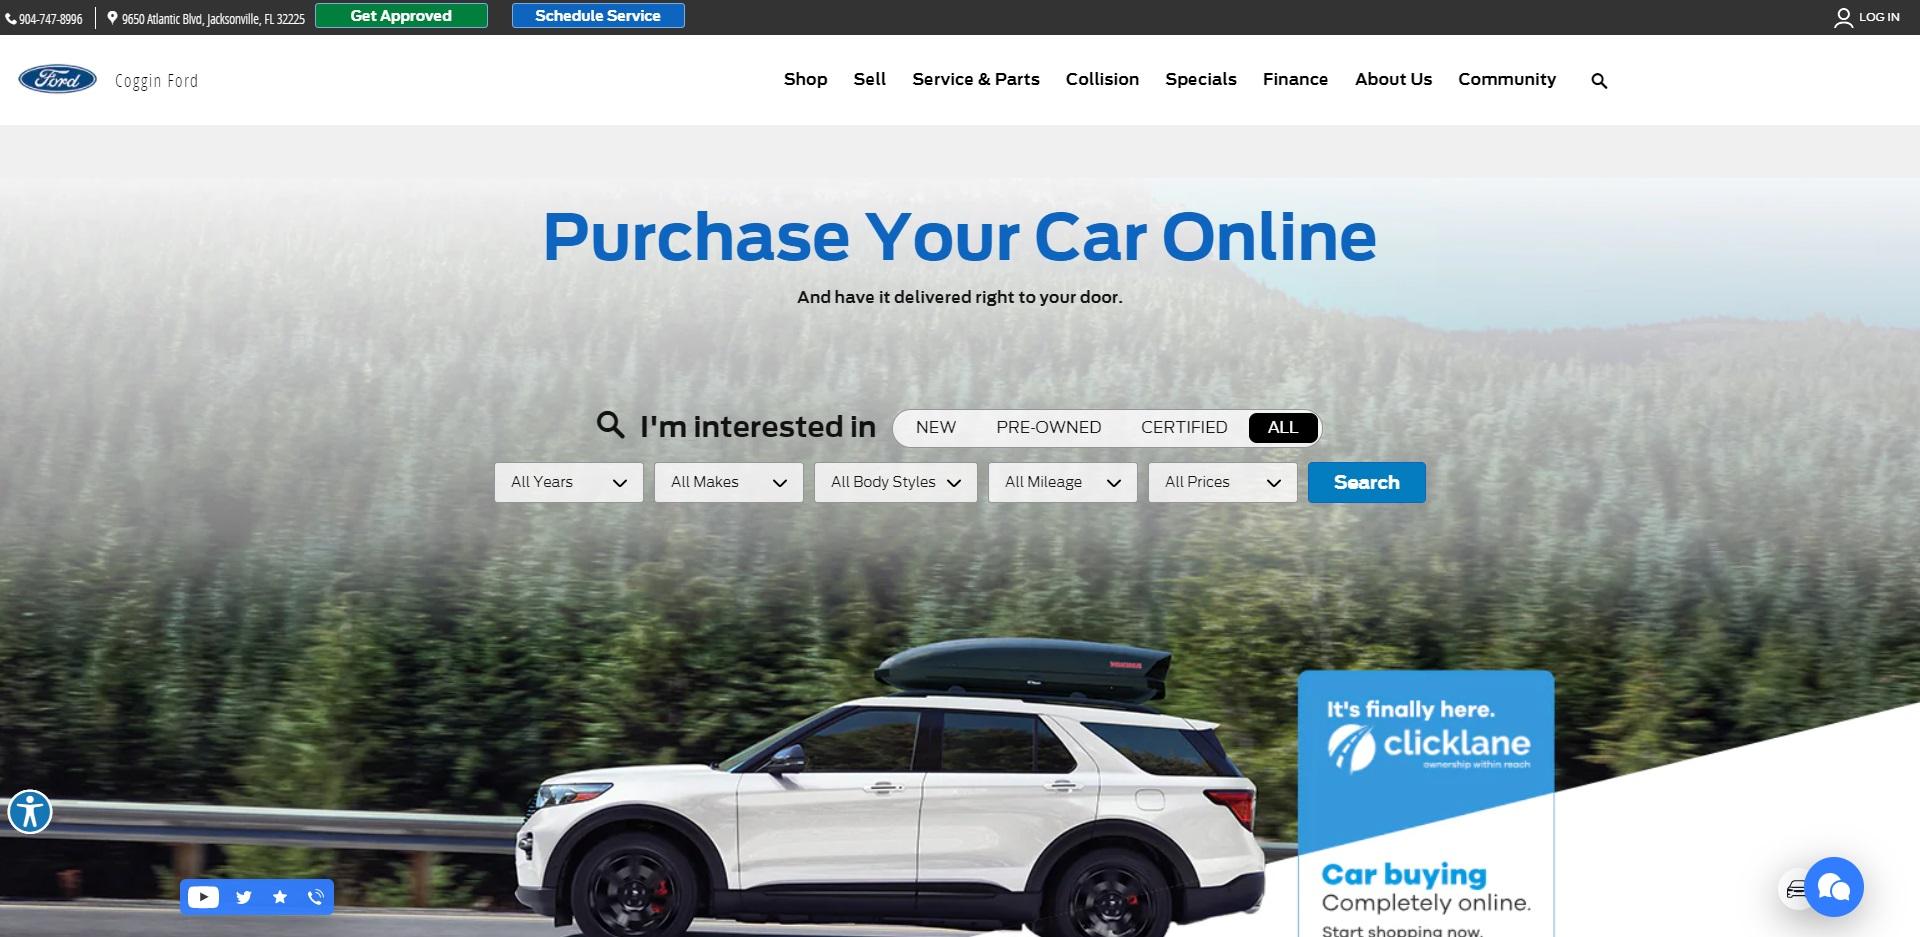 5 Best Ford Dealers in Jacksonville, FL